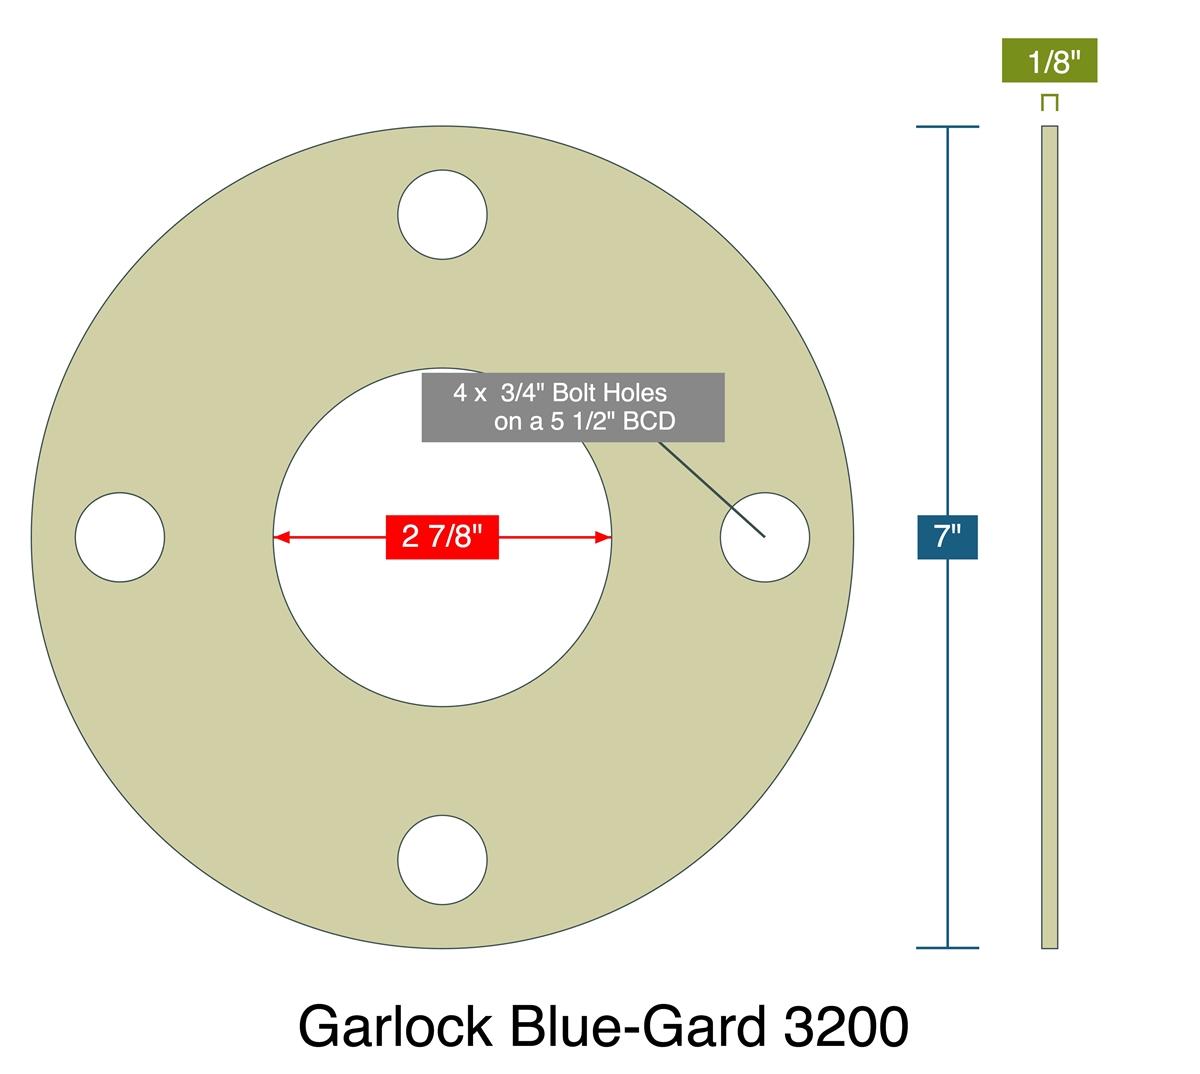 "LOT OF 20 GARLOCK BLUE-GARD GASKETS 11/"" OD 8-5//8/"" ID 1-1//8/"" FLANGE C4"